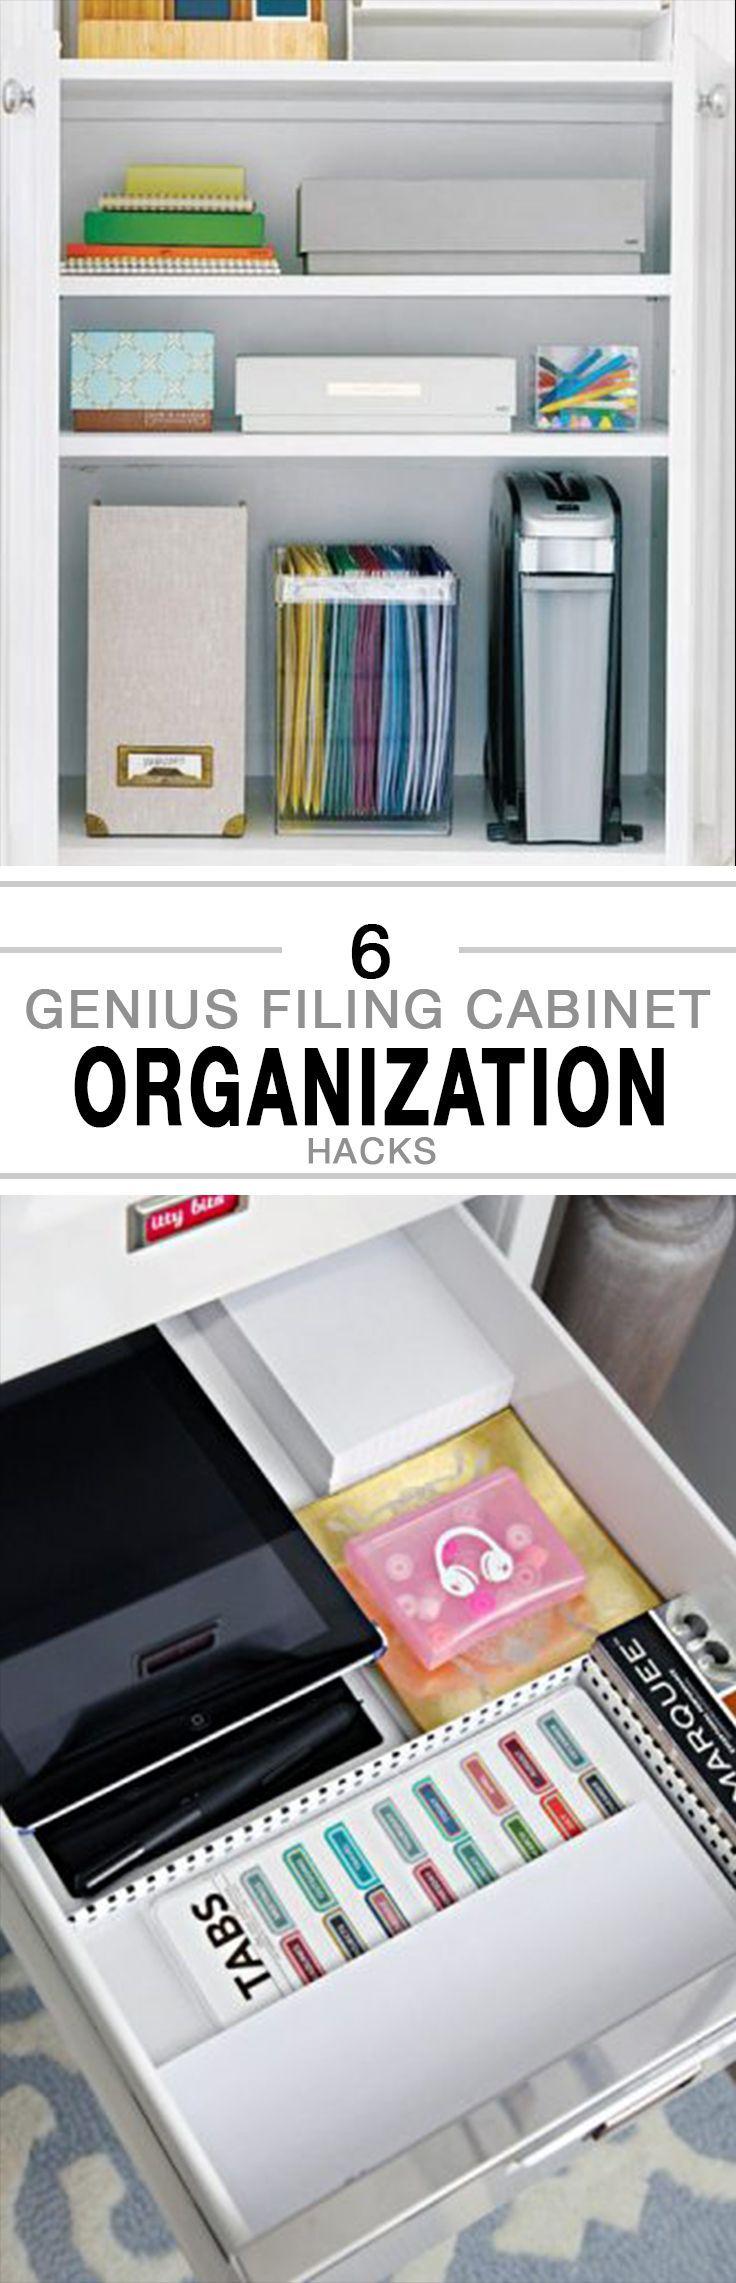 6 Genius Filing Cabinet Organization Hacks -   Organization ...